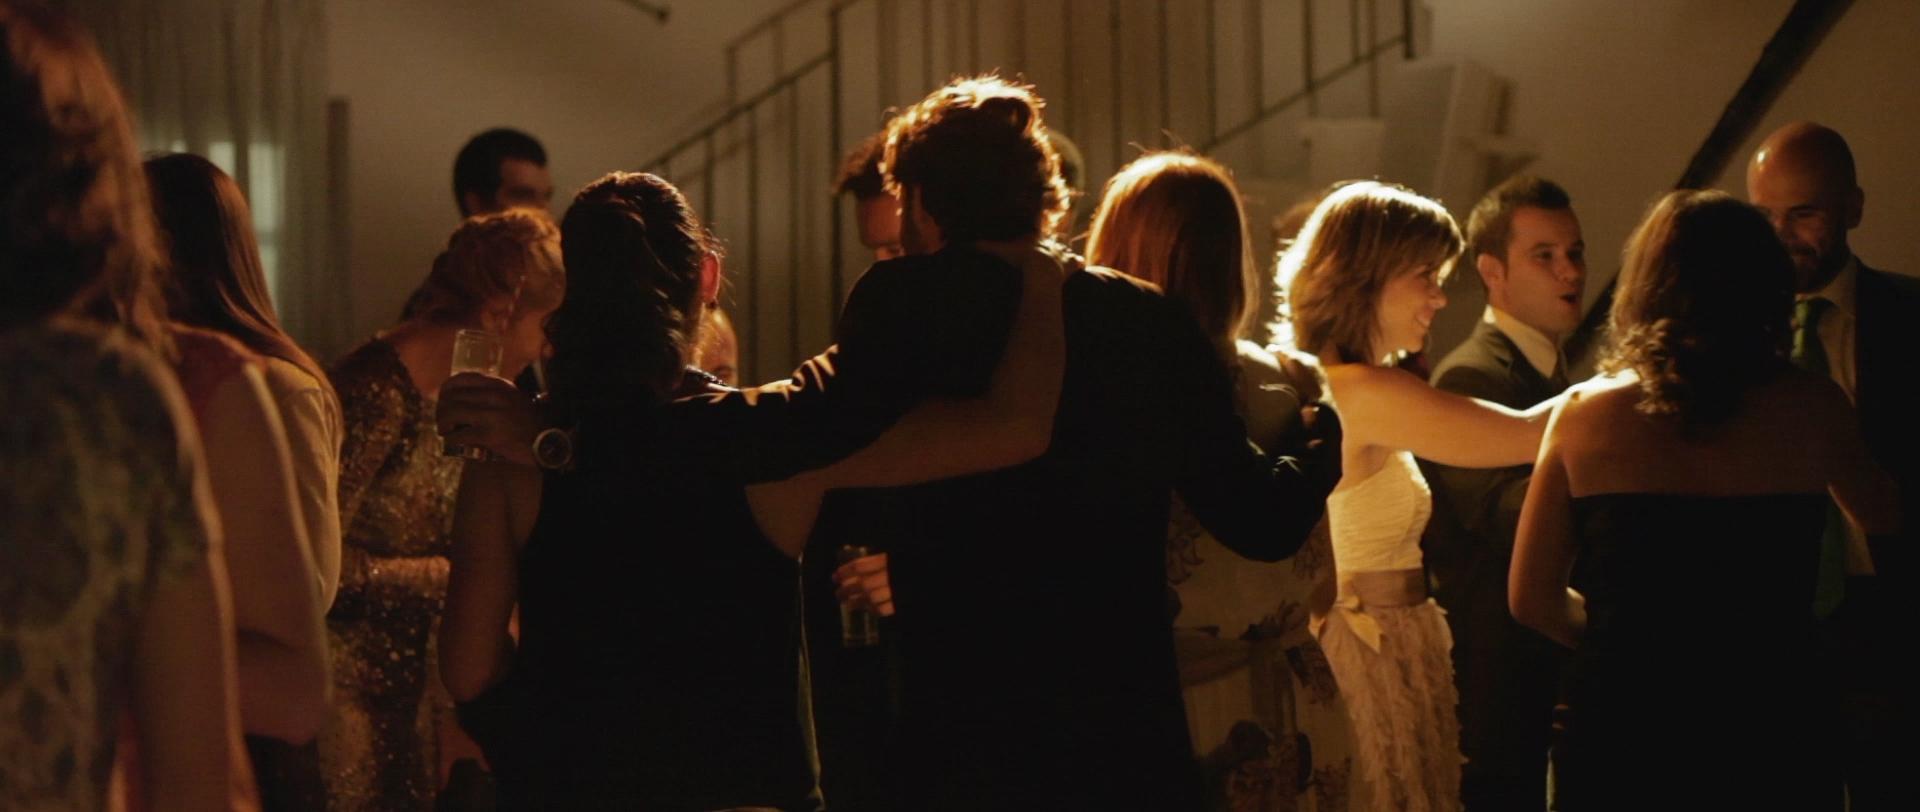 Frederic & Valentina | Trailer (Eng) 4